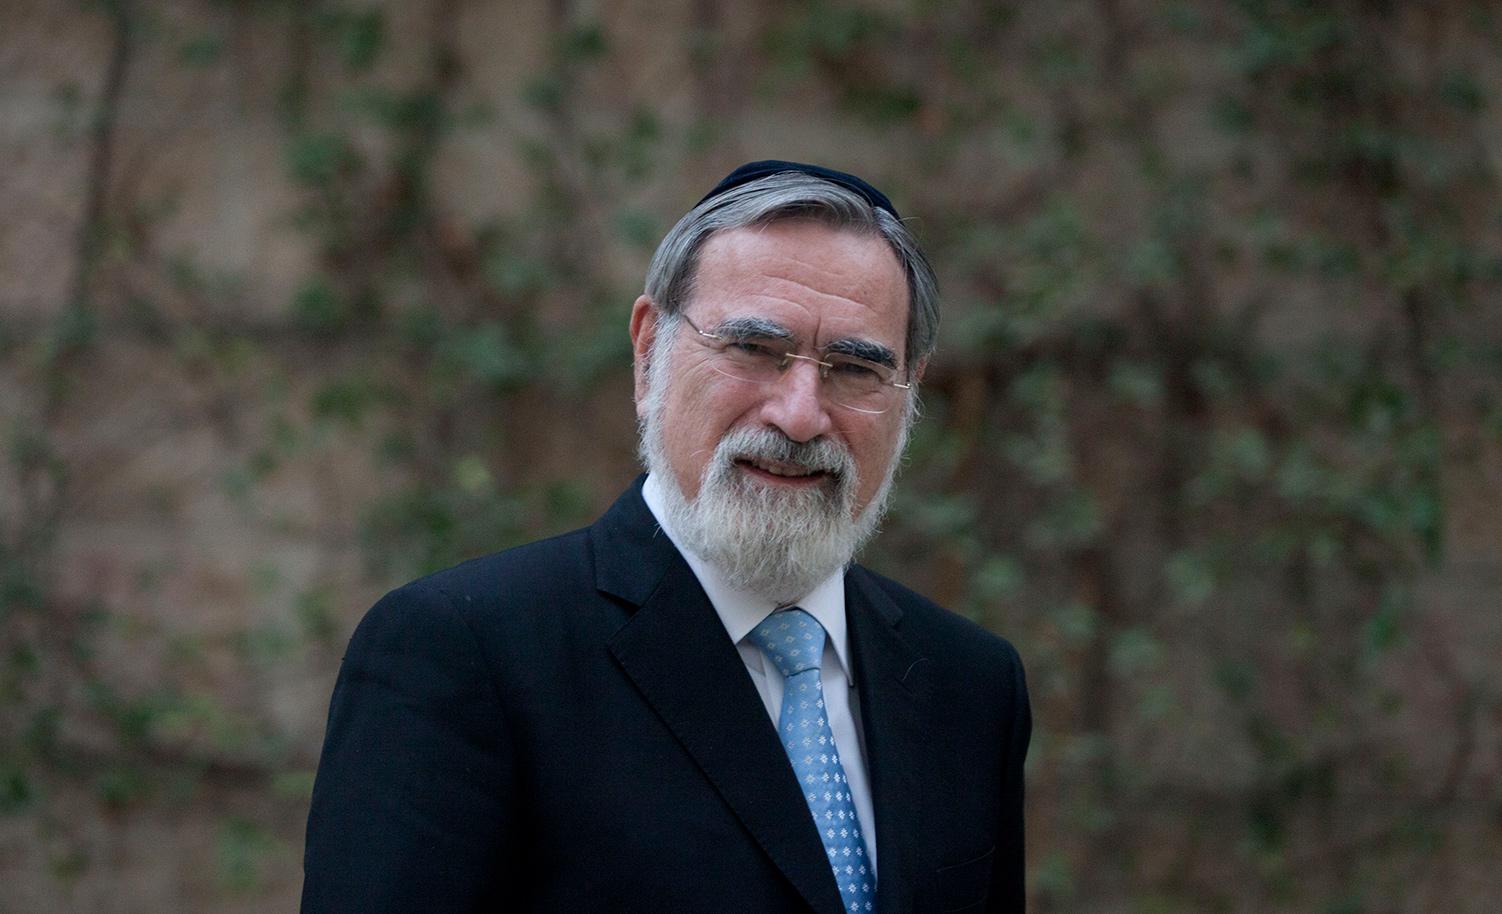 Rabbi Lord Jonathan Sacks on November 10, 2013 in Jerusalem. Lior Mizrahi/Getty Images.